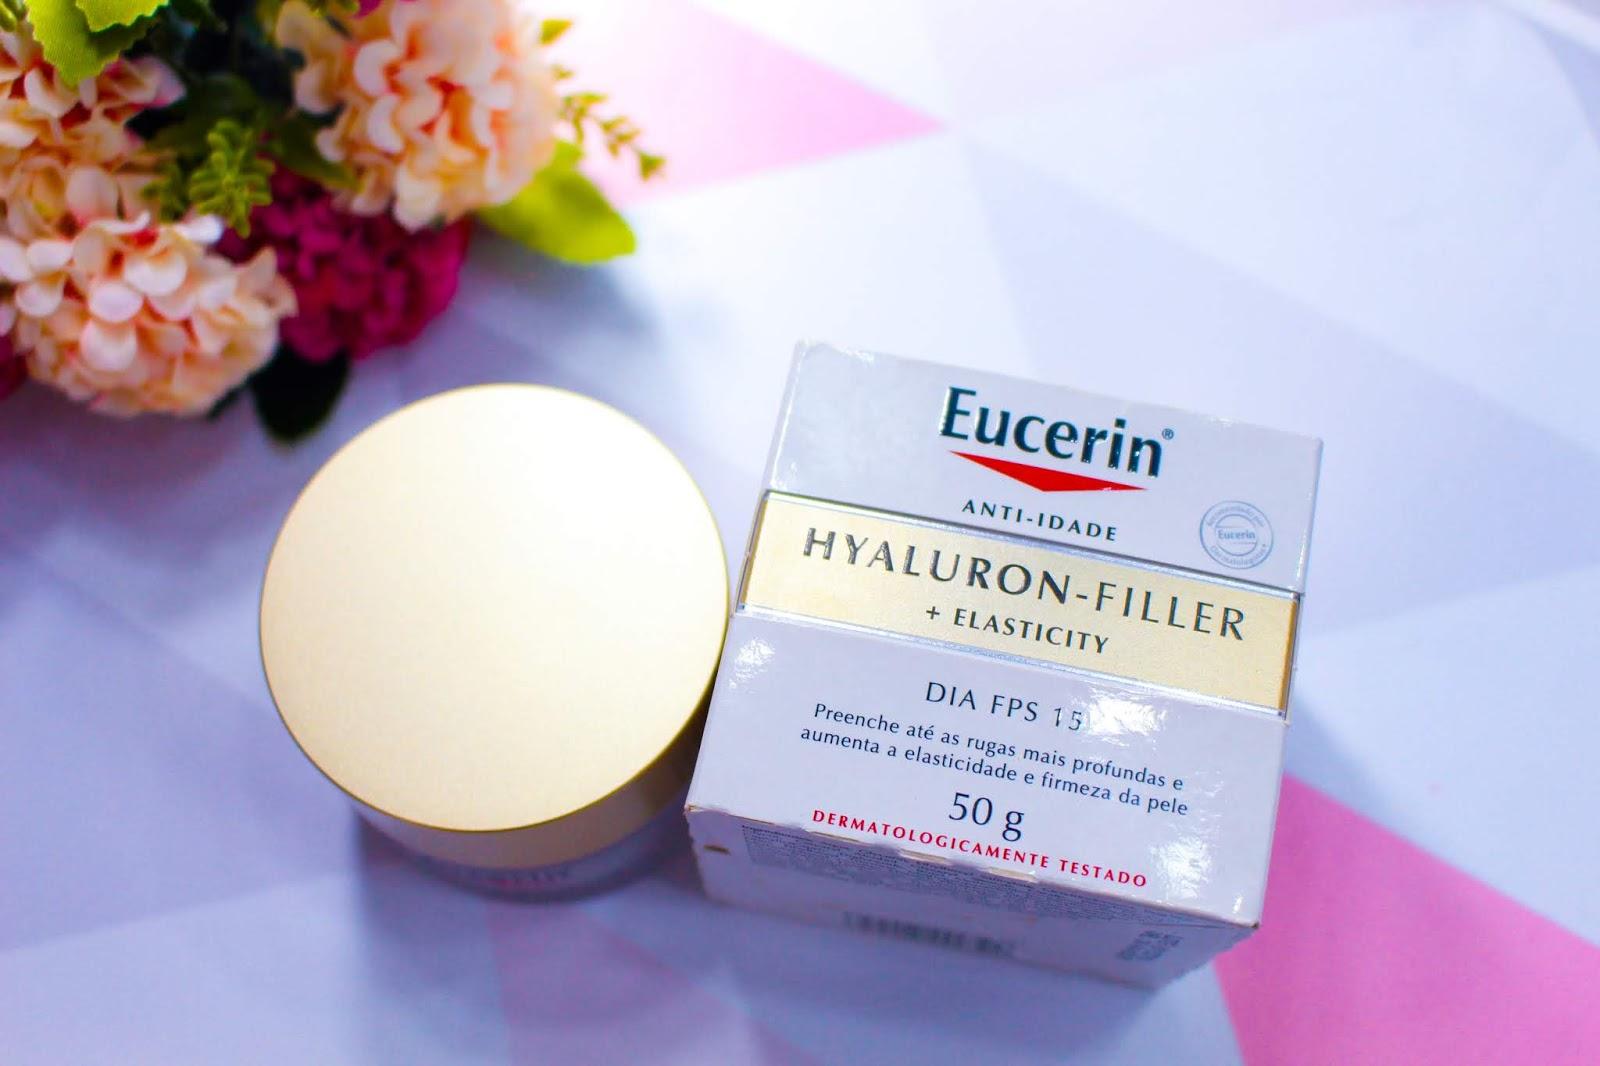 Resenha: Anti-Idade Hyaluron Filler + Elasticity Dia da Eucerin